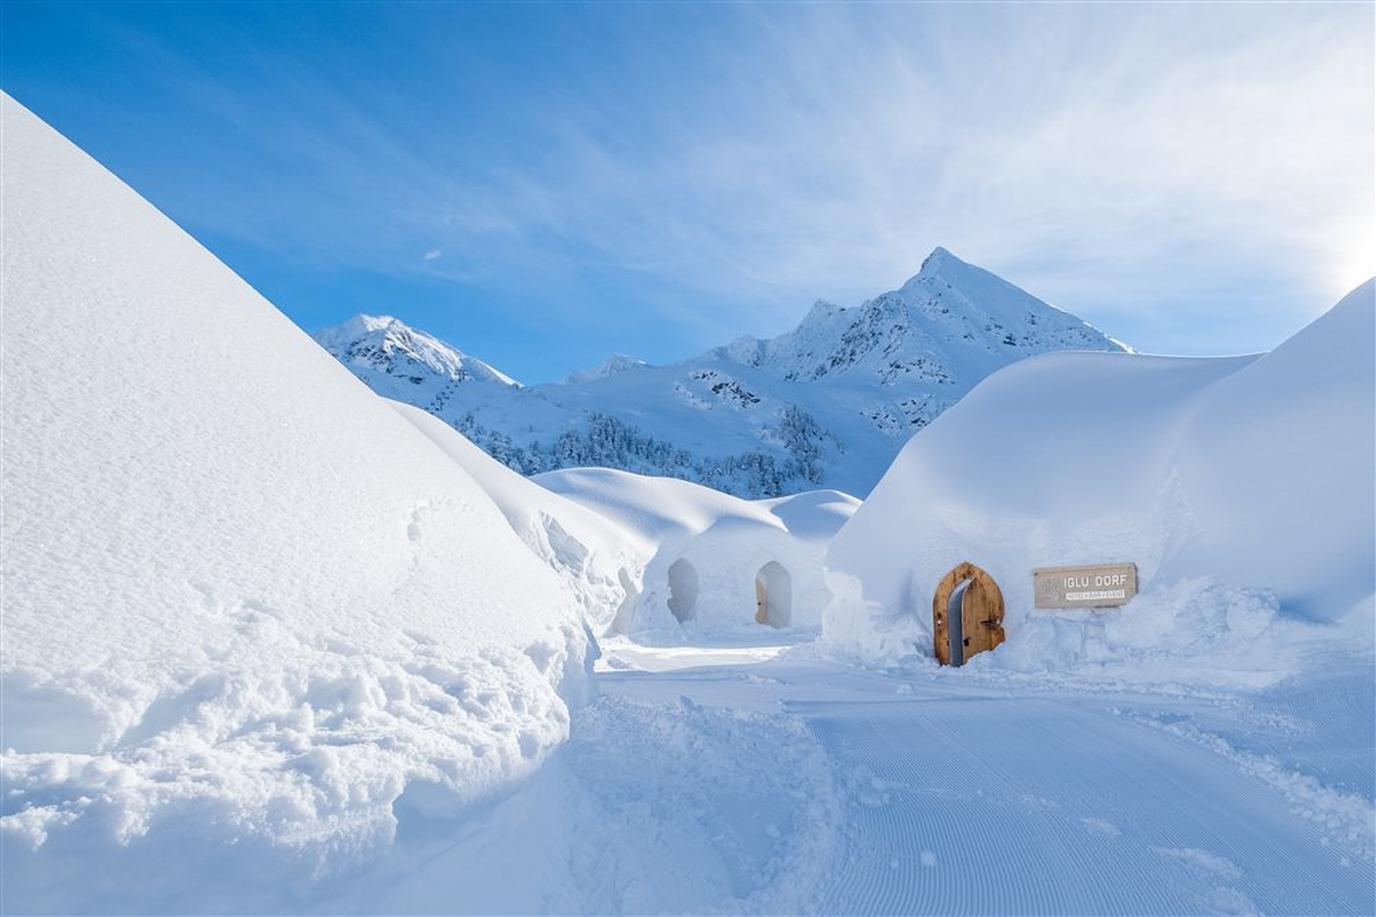 Iglu-Dorf Kühtai is the only Austrian pet-friendly igloo village across the Iglu-Dorf network.